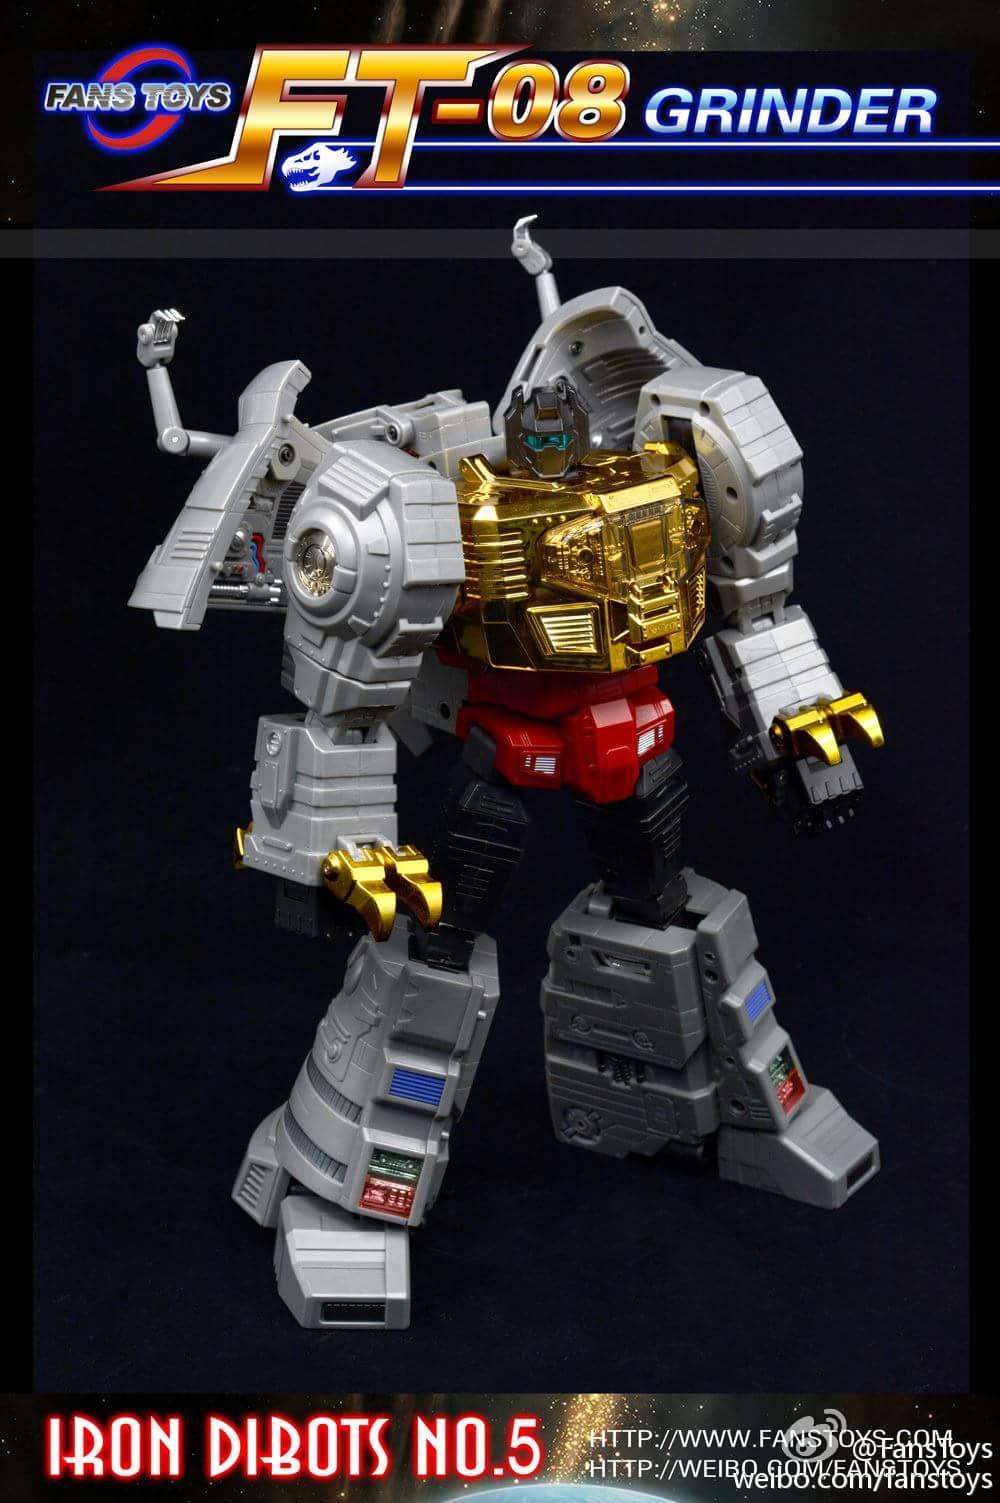 [Fanstoys] Produit Tiers - Dinobots - FT-04 Scoria, FT-05 Soar, FT-06 Sever, FT-07 Stomp, FT-08 Grinder - Page 9 9Rv8QYm5